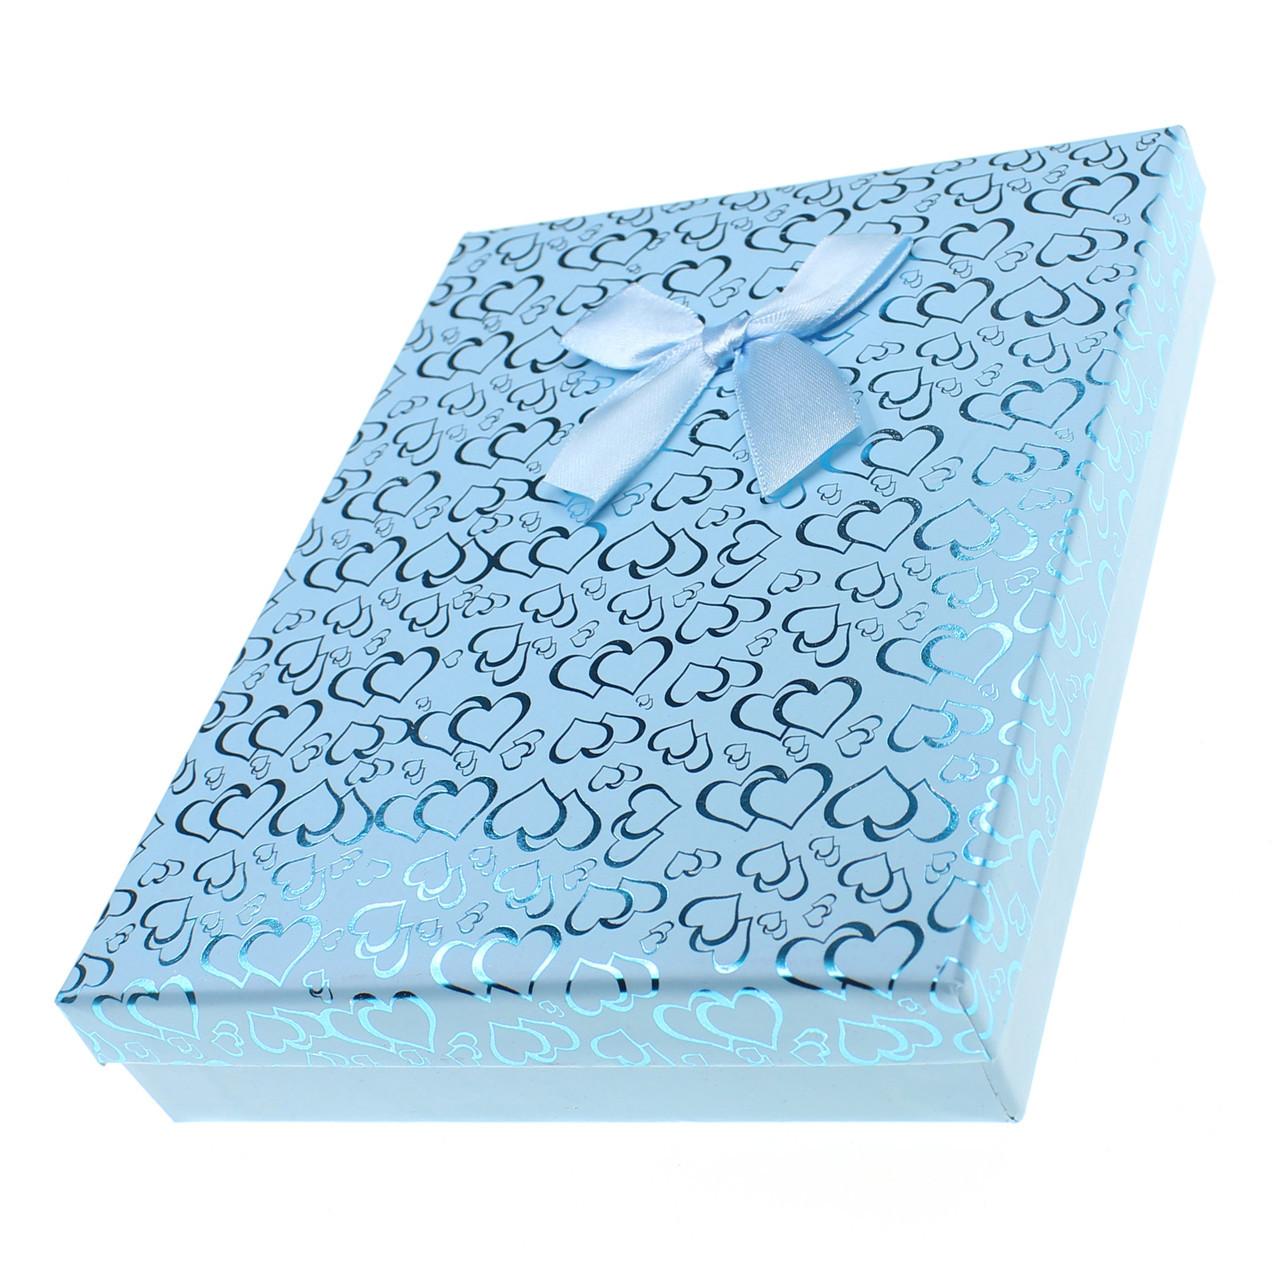 Подарочная коробочка под набор Сердечки с бантом  16,5х12,5х3 см, голубая